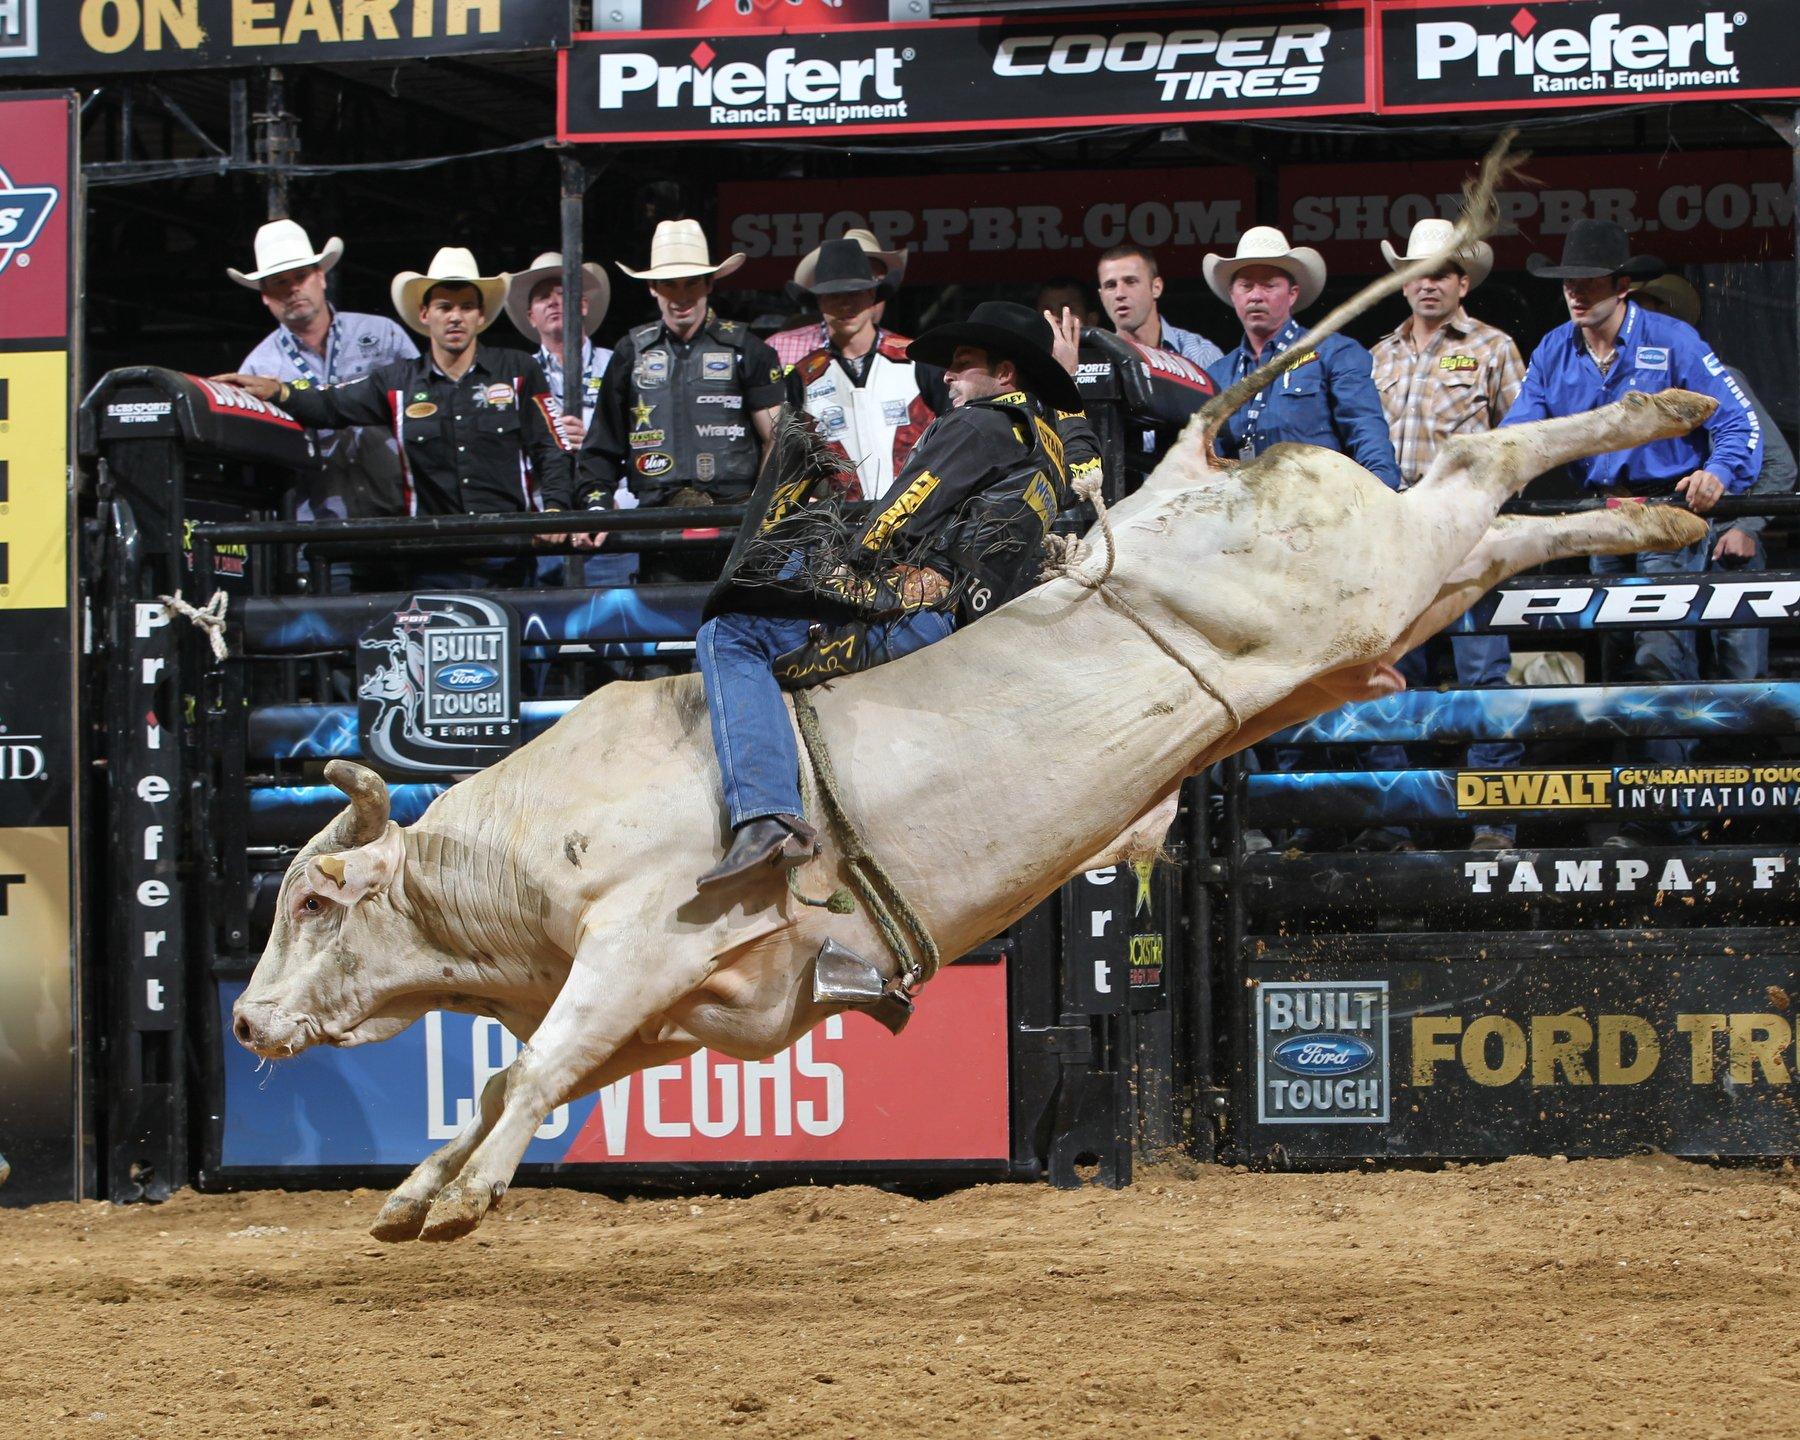 Pbr wallpaper wallpapersafari - Bull riding wallpapers ...